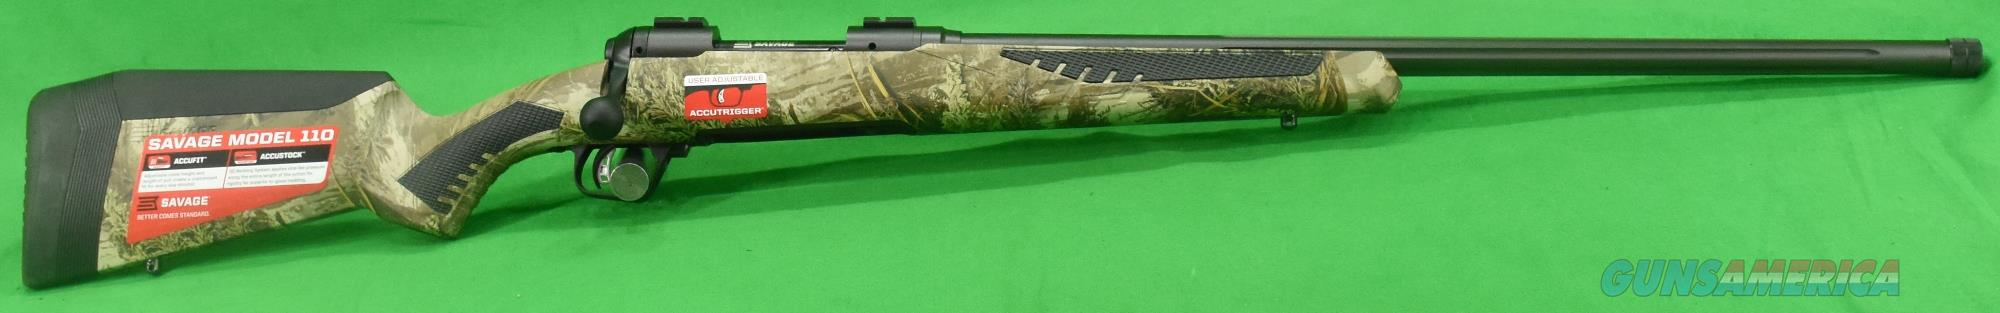 110 Predator Max1 243Win 24In  57003  Guns > Rifles > Savage Rifles > 10/110